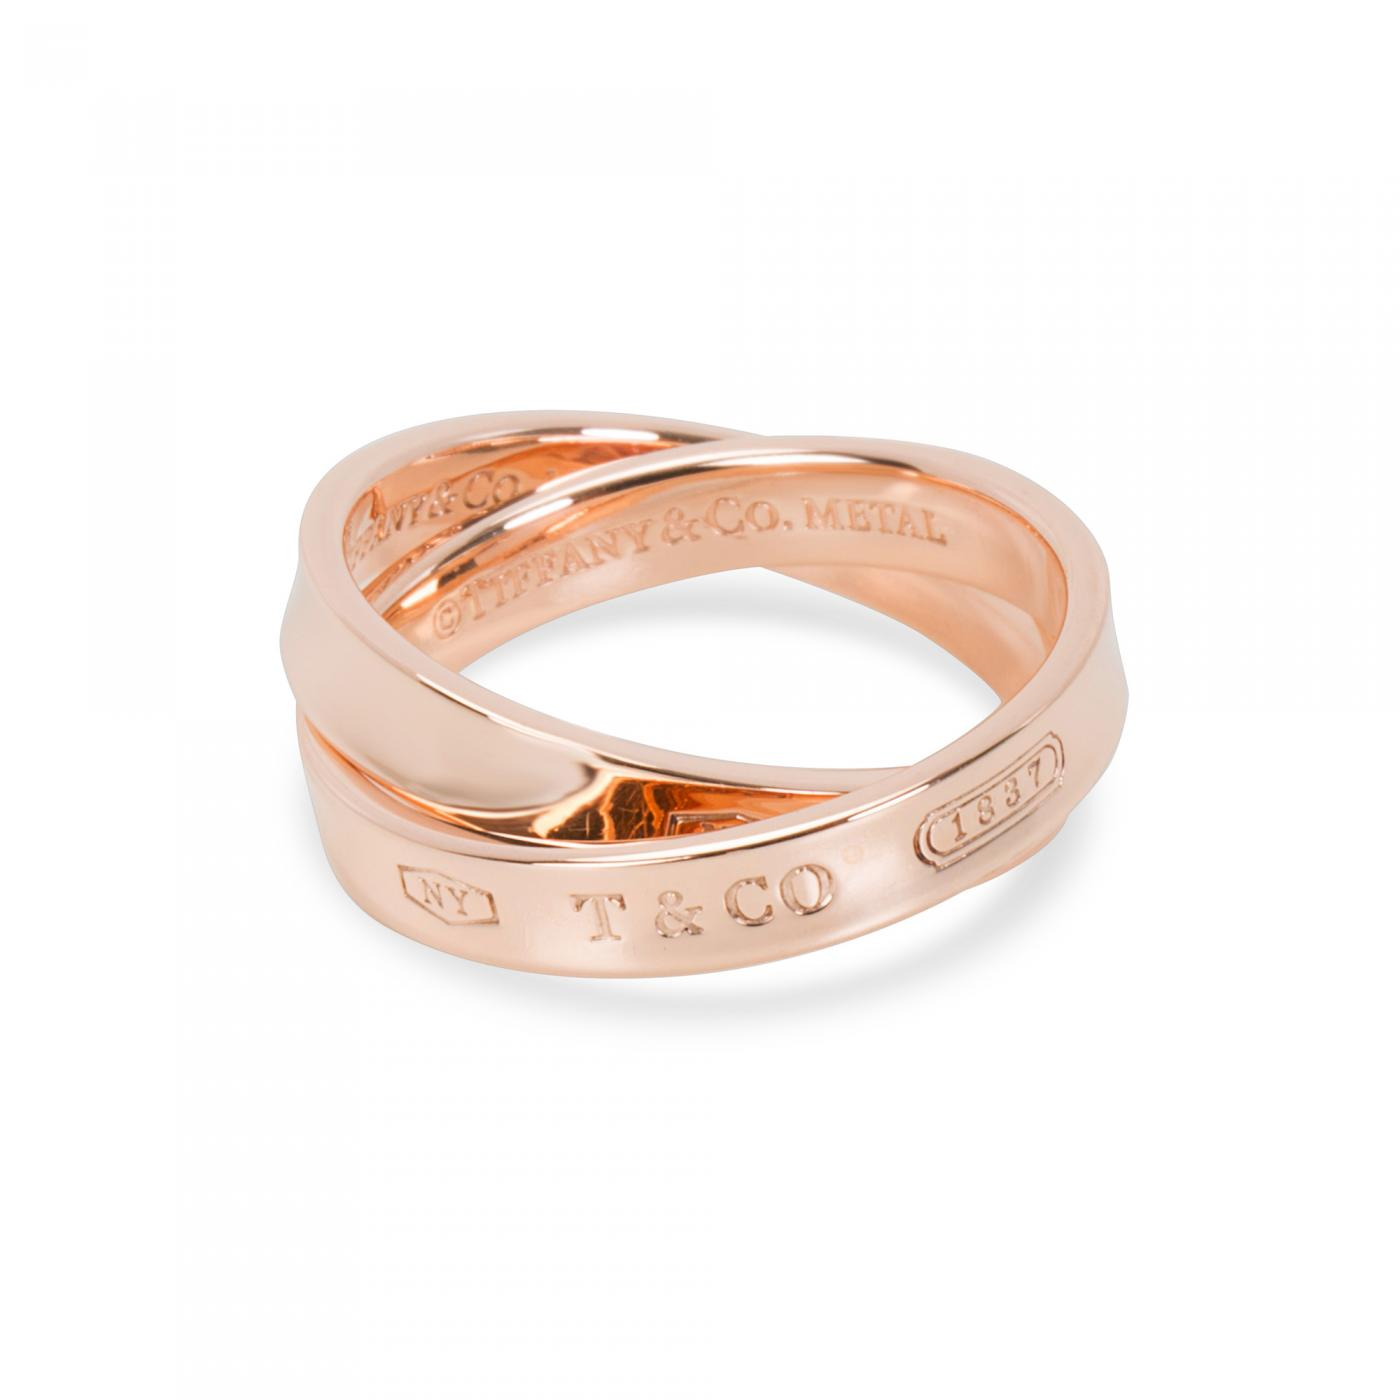 Tiffany & Co. - Tiffany & Co. 1837 Rubedo Interlocking Circles Ring in 8K Rose Gold